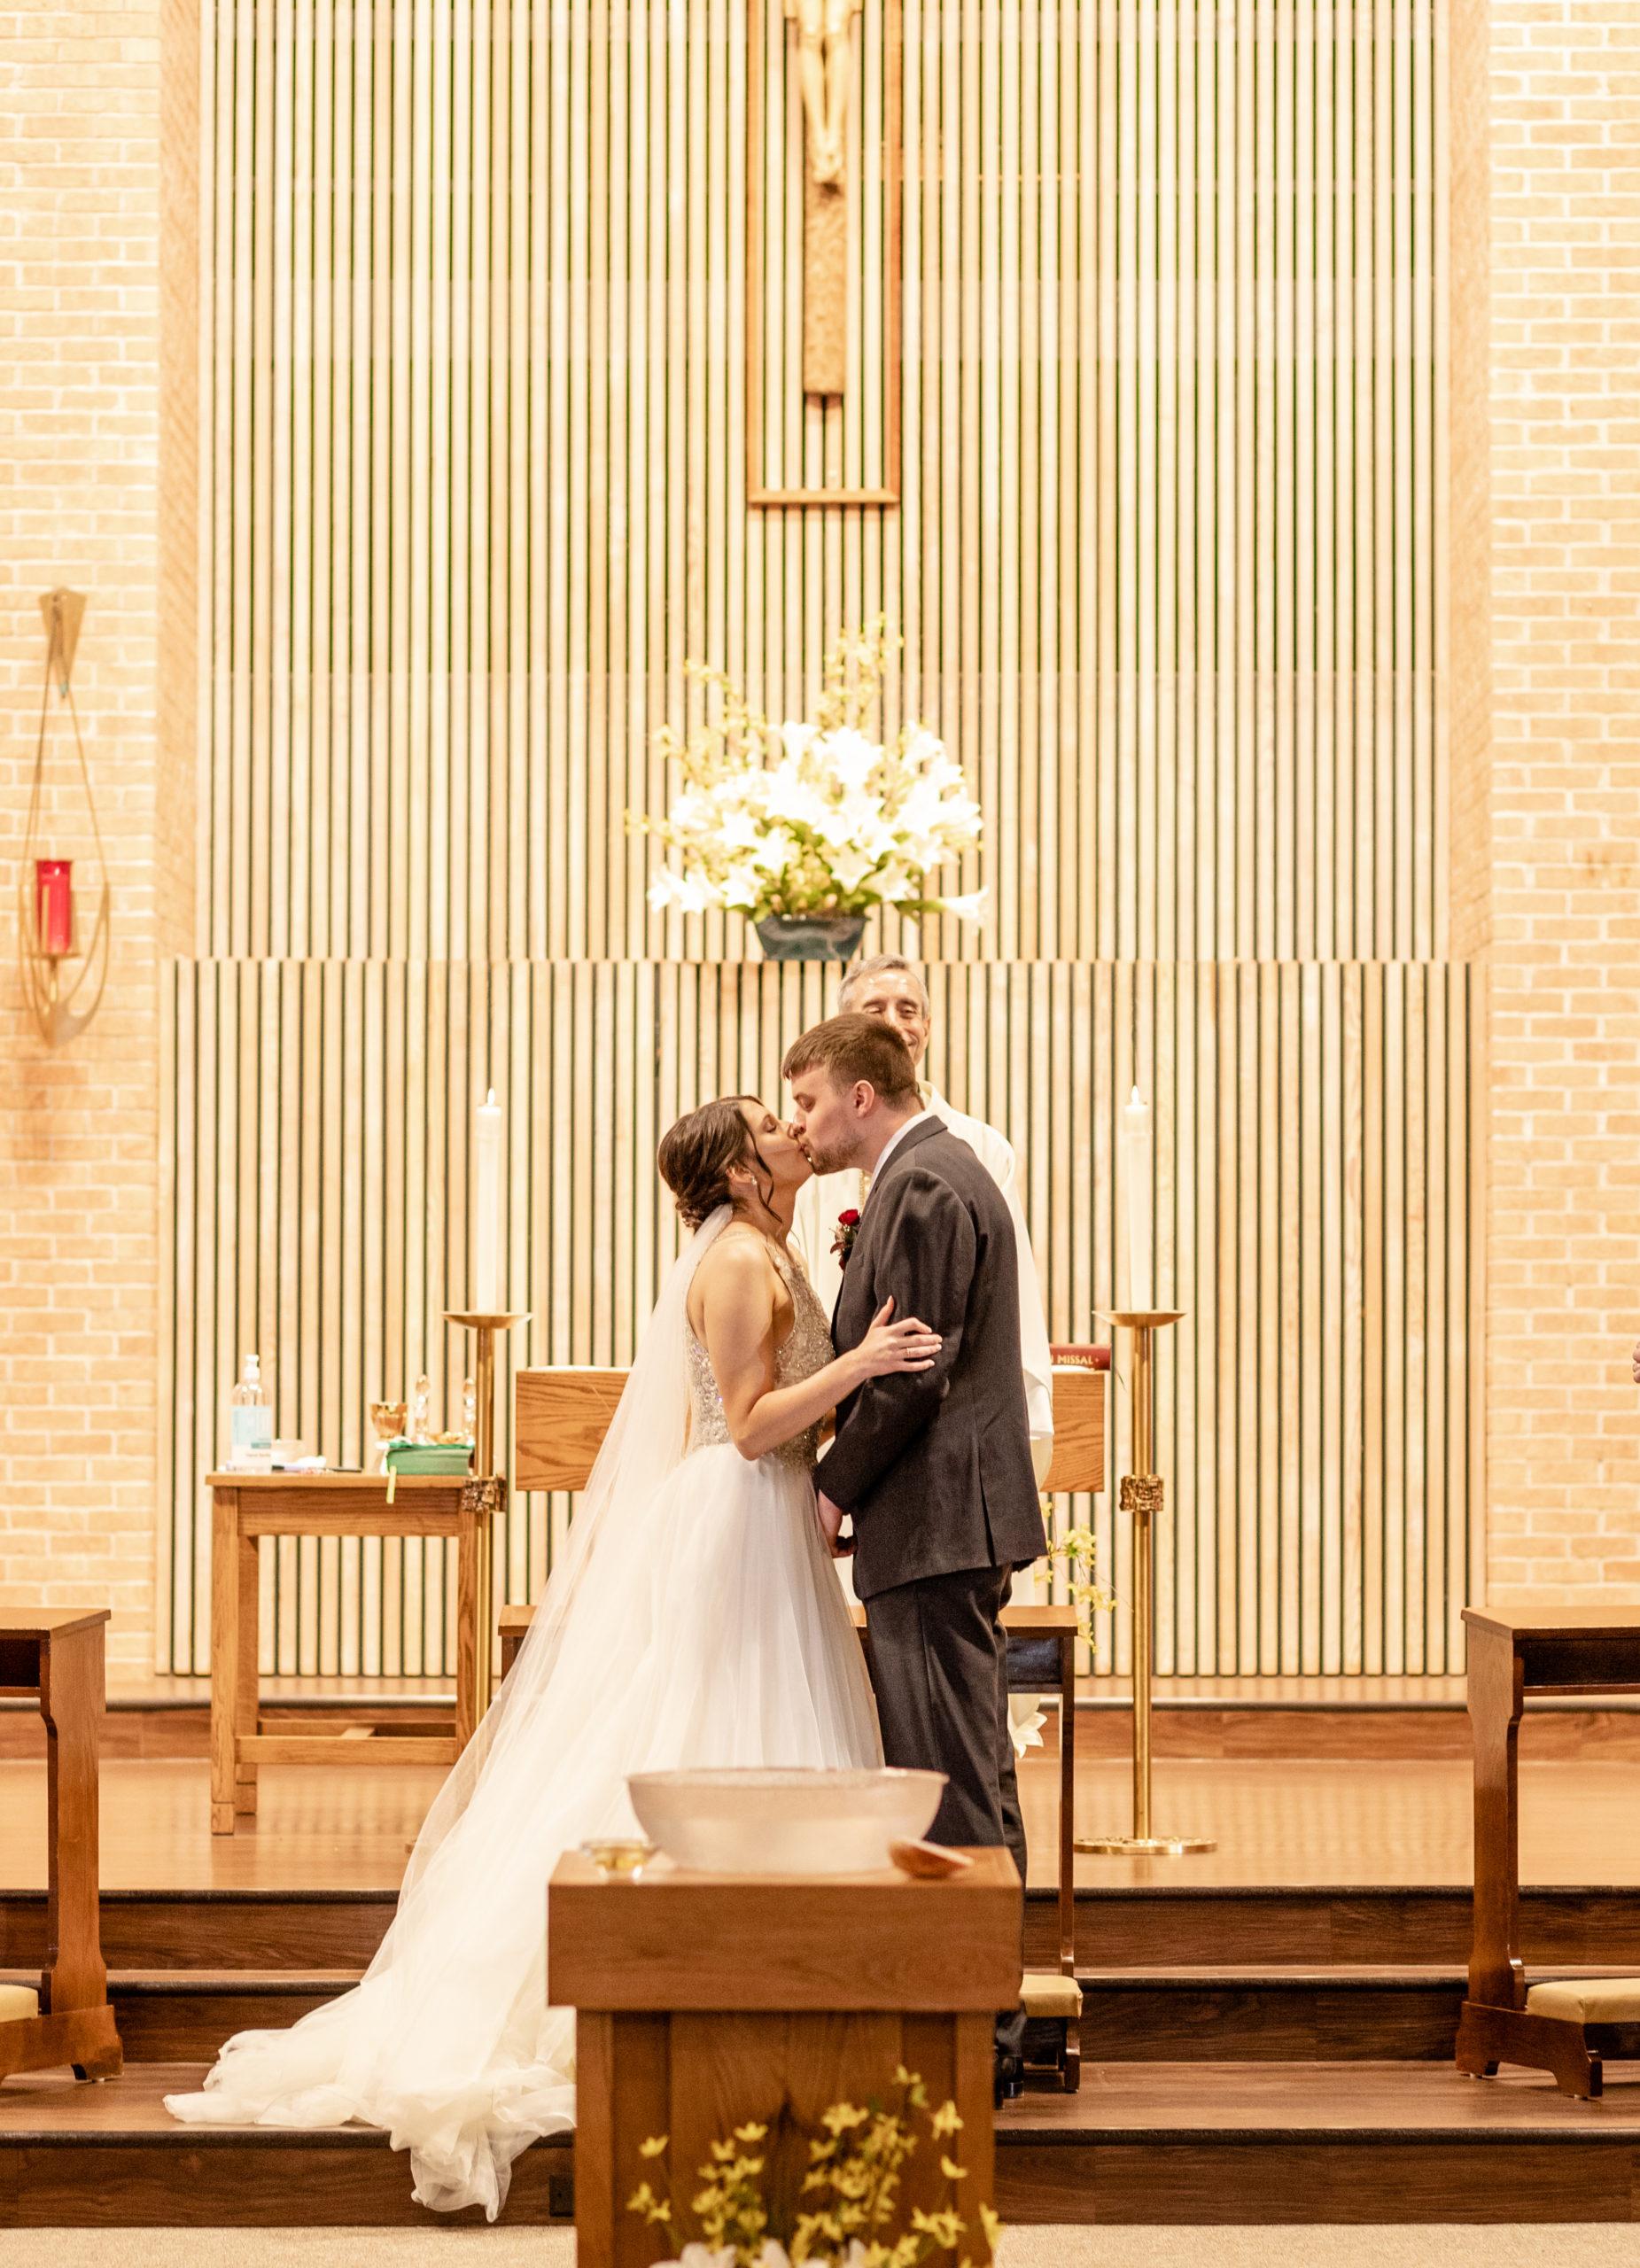 church wedding, bride and groom, kissing,